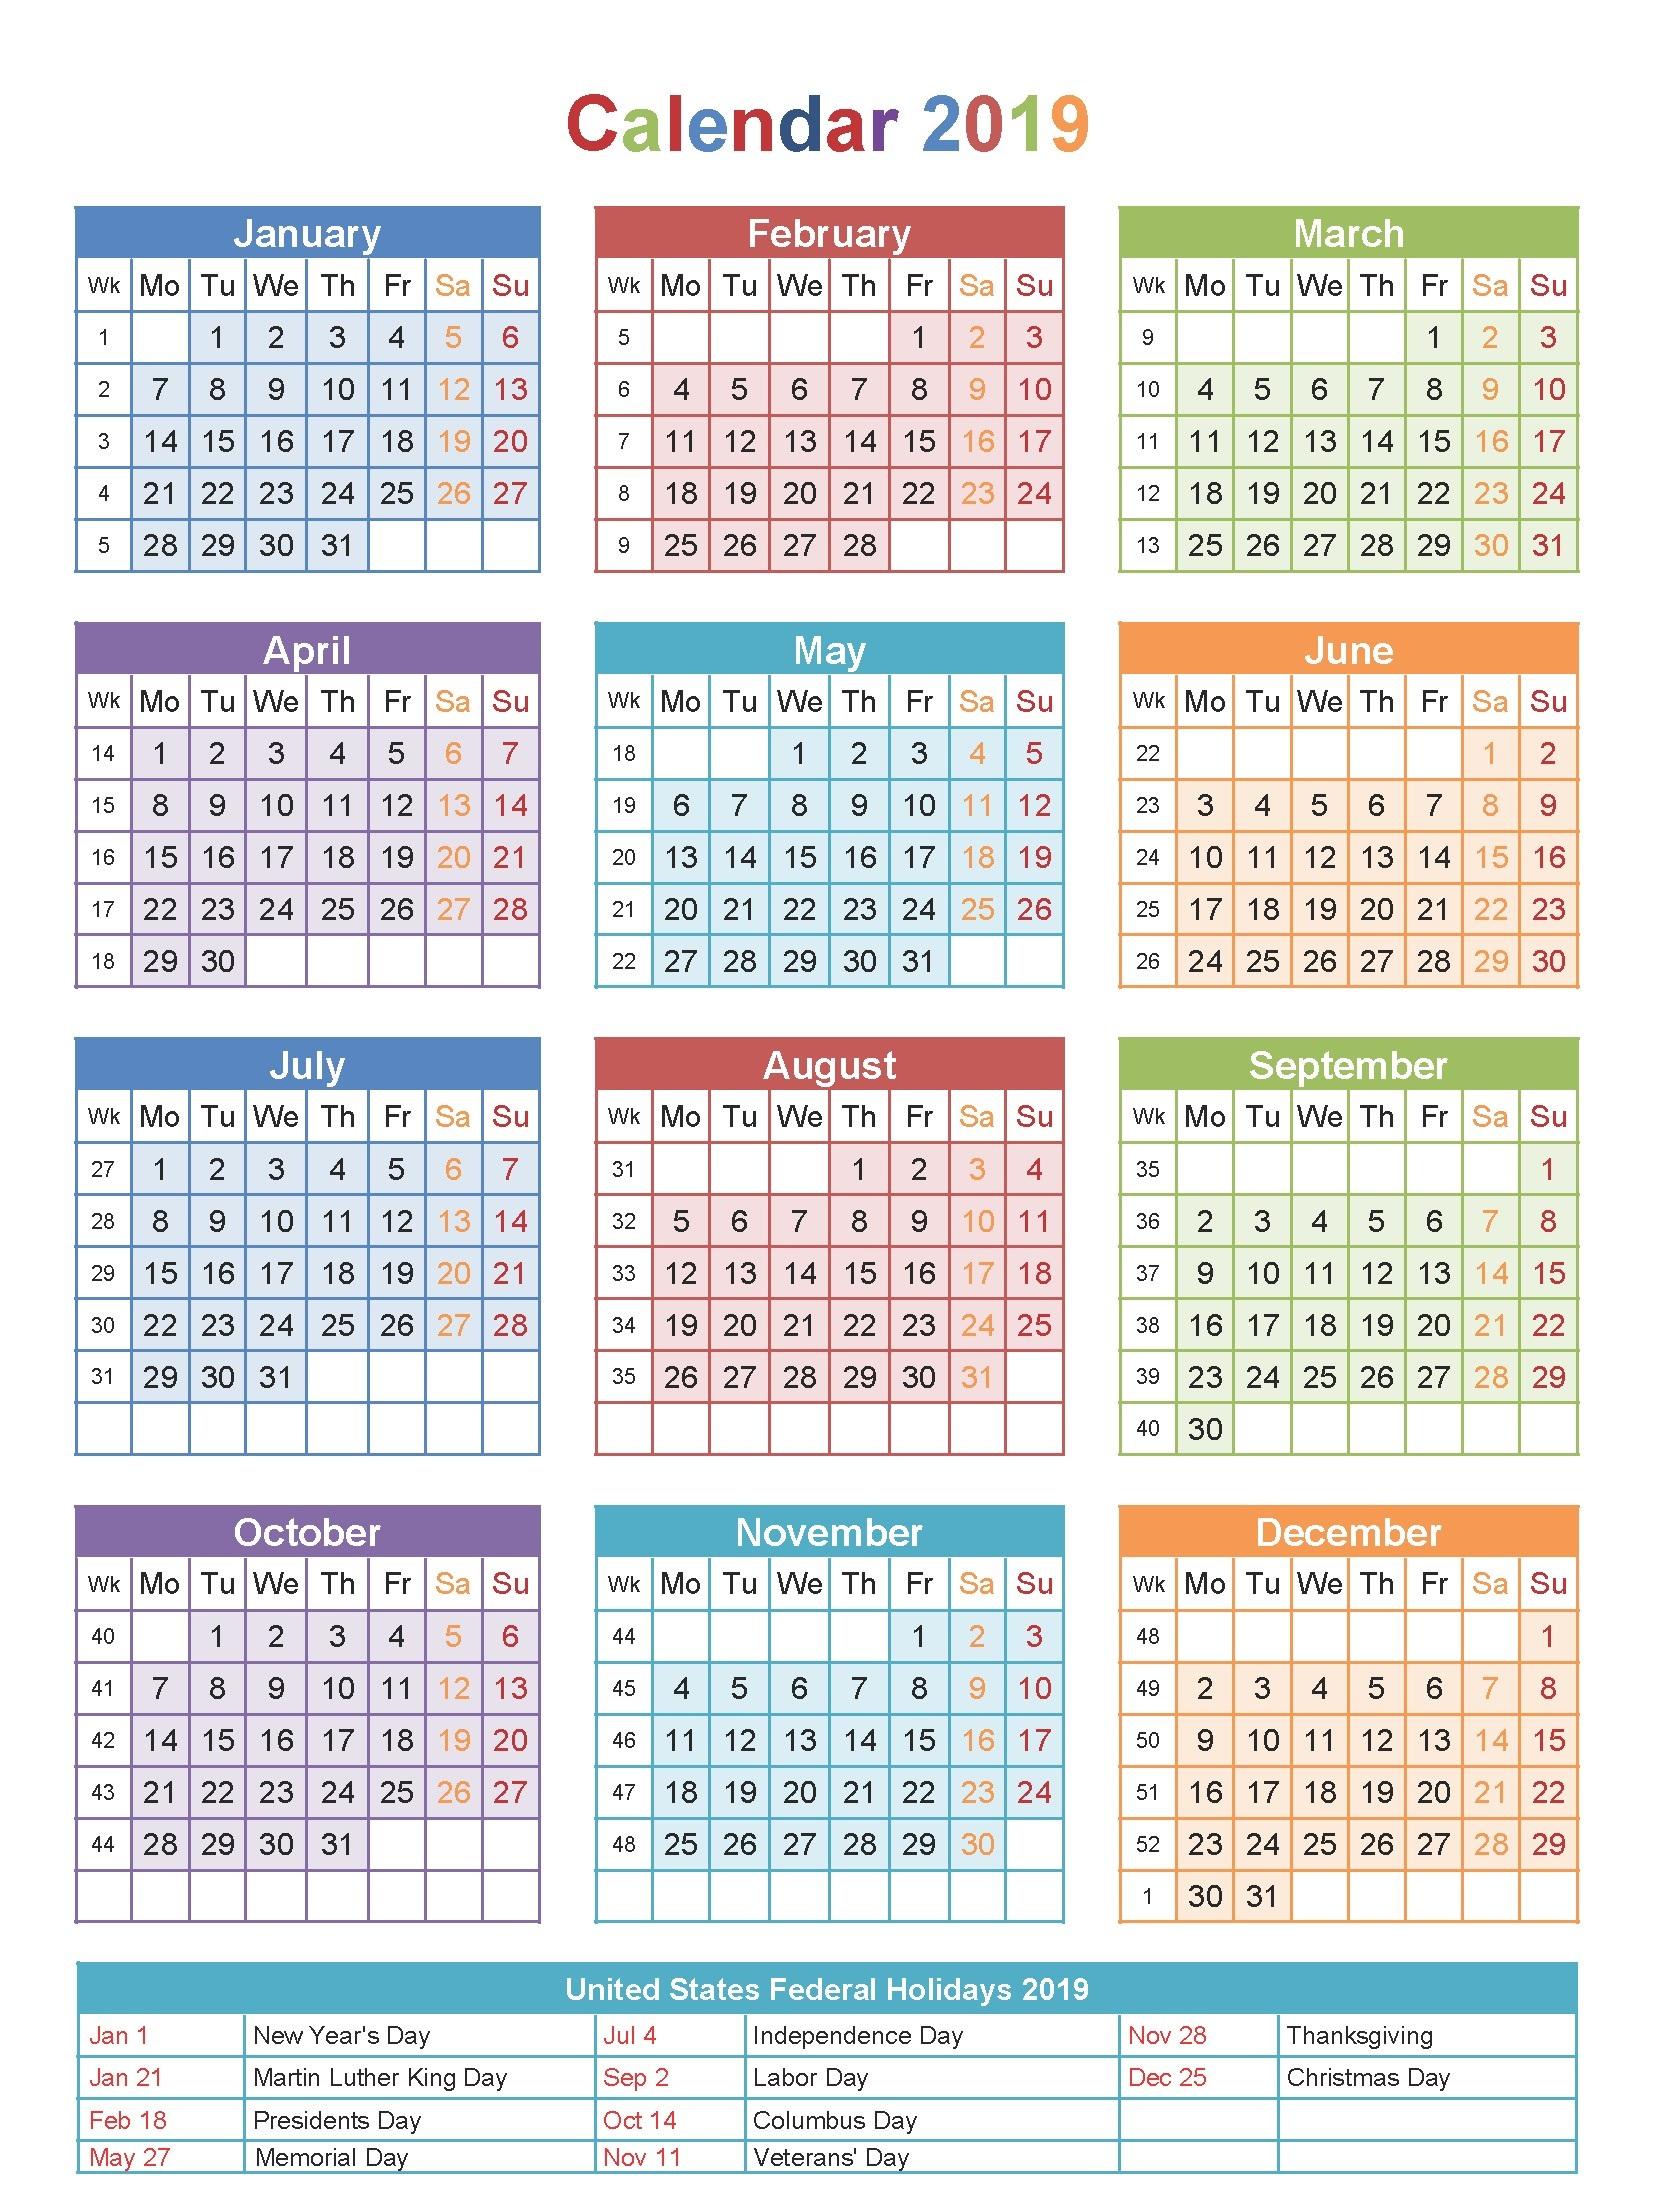 Holidays Calendar 2019